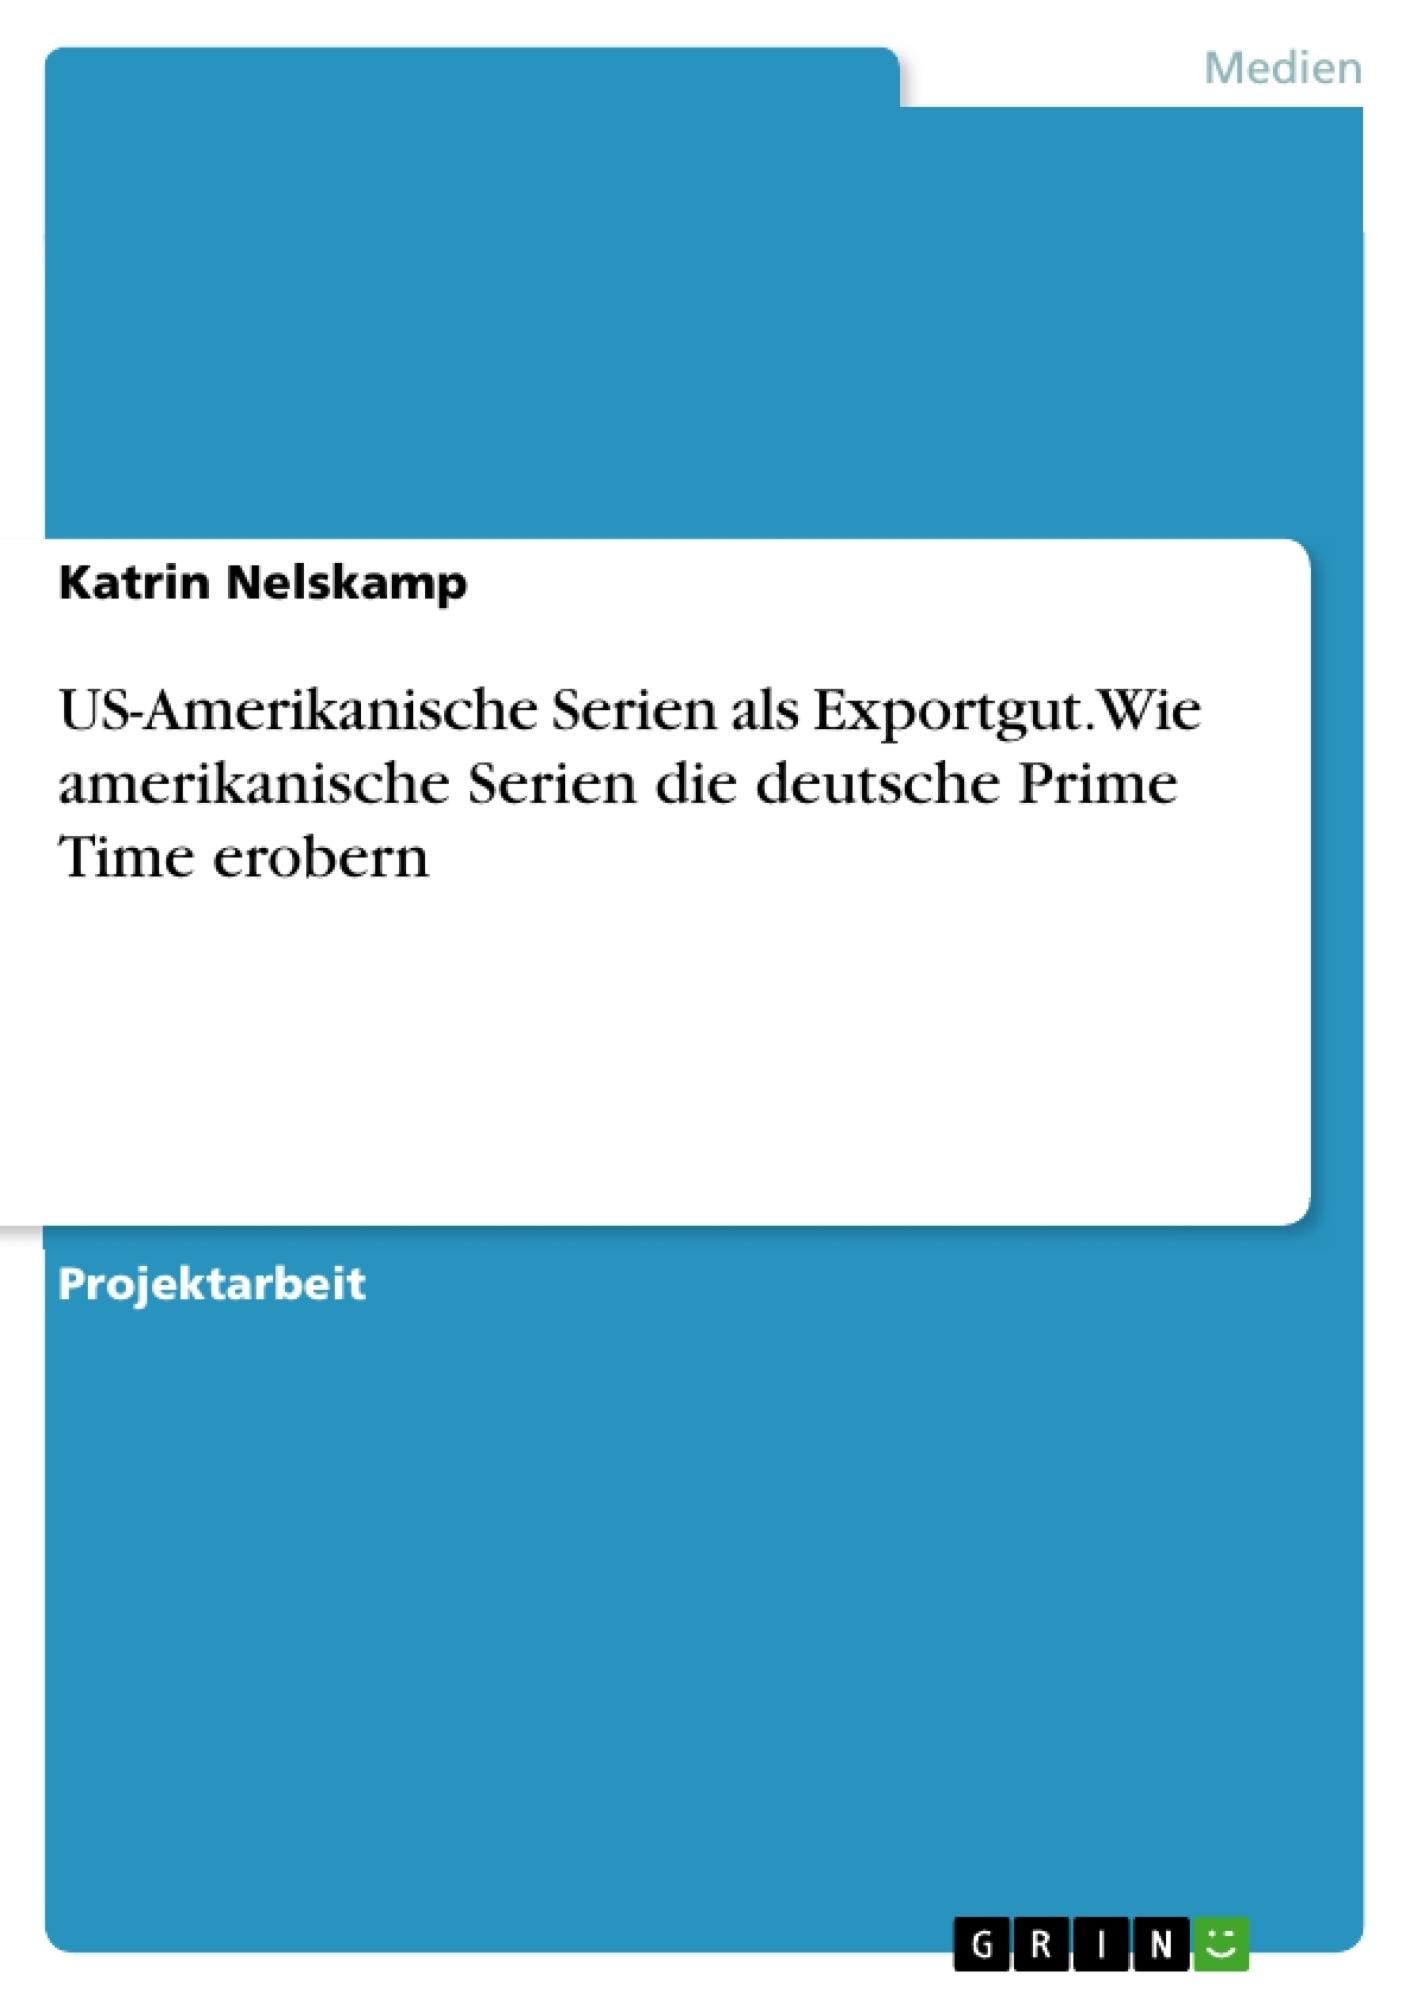 Titel: US-Amerikanische Serien als Exportgut. Wie amerikanische Serien die deutsche Prime Time erobern